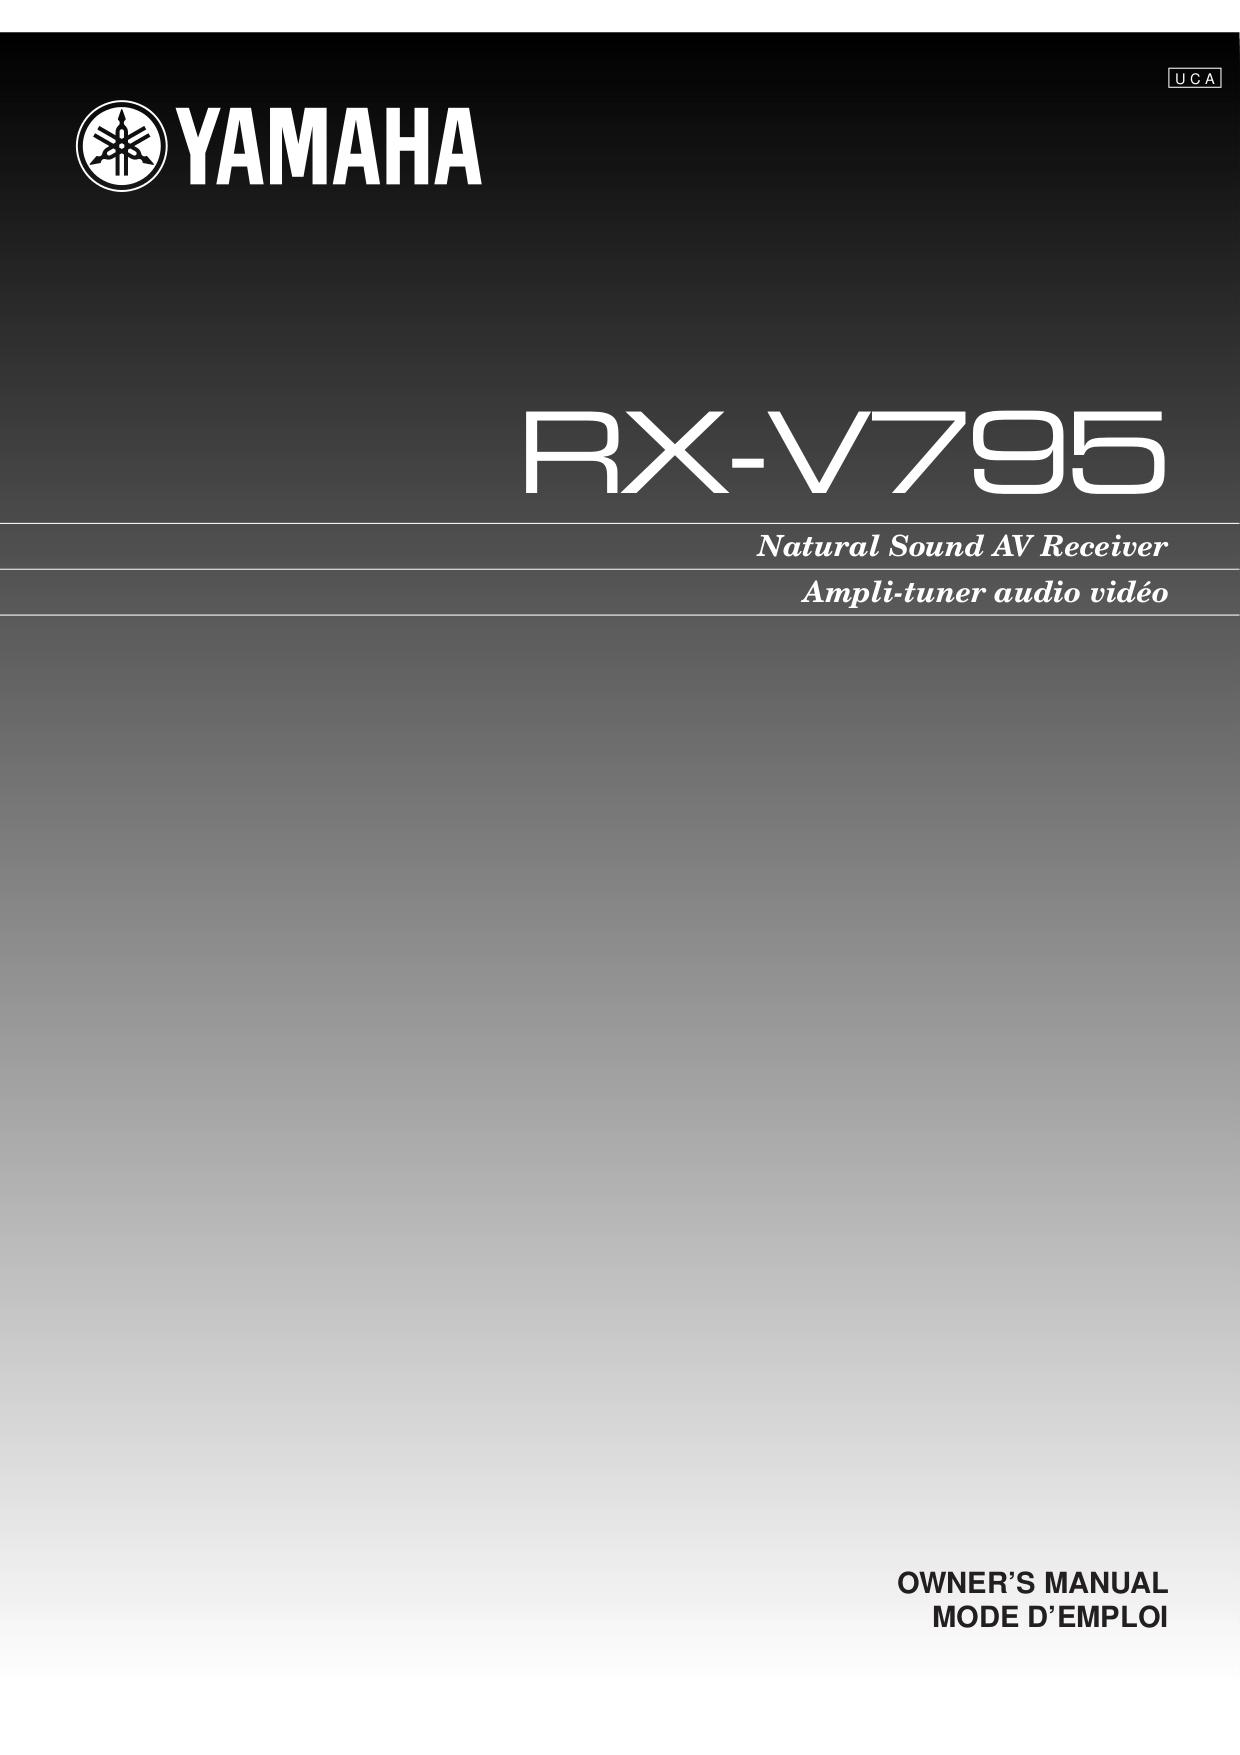 Yamaha Rx V795 Manual Stihl Chainsaw Parts Diagram Besides Fs 55 Carburetor Array Download Free Pdf For Receiver Rh Umlib Com